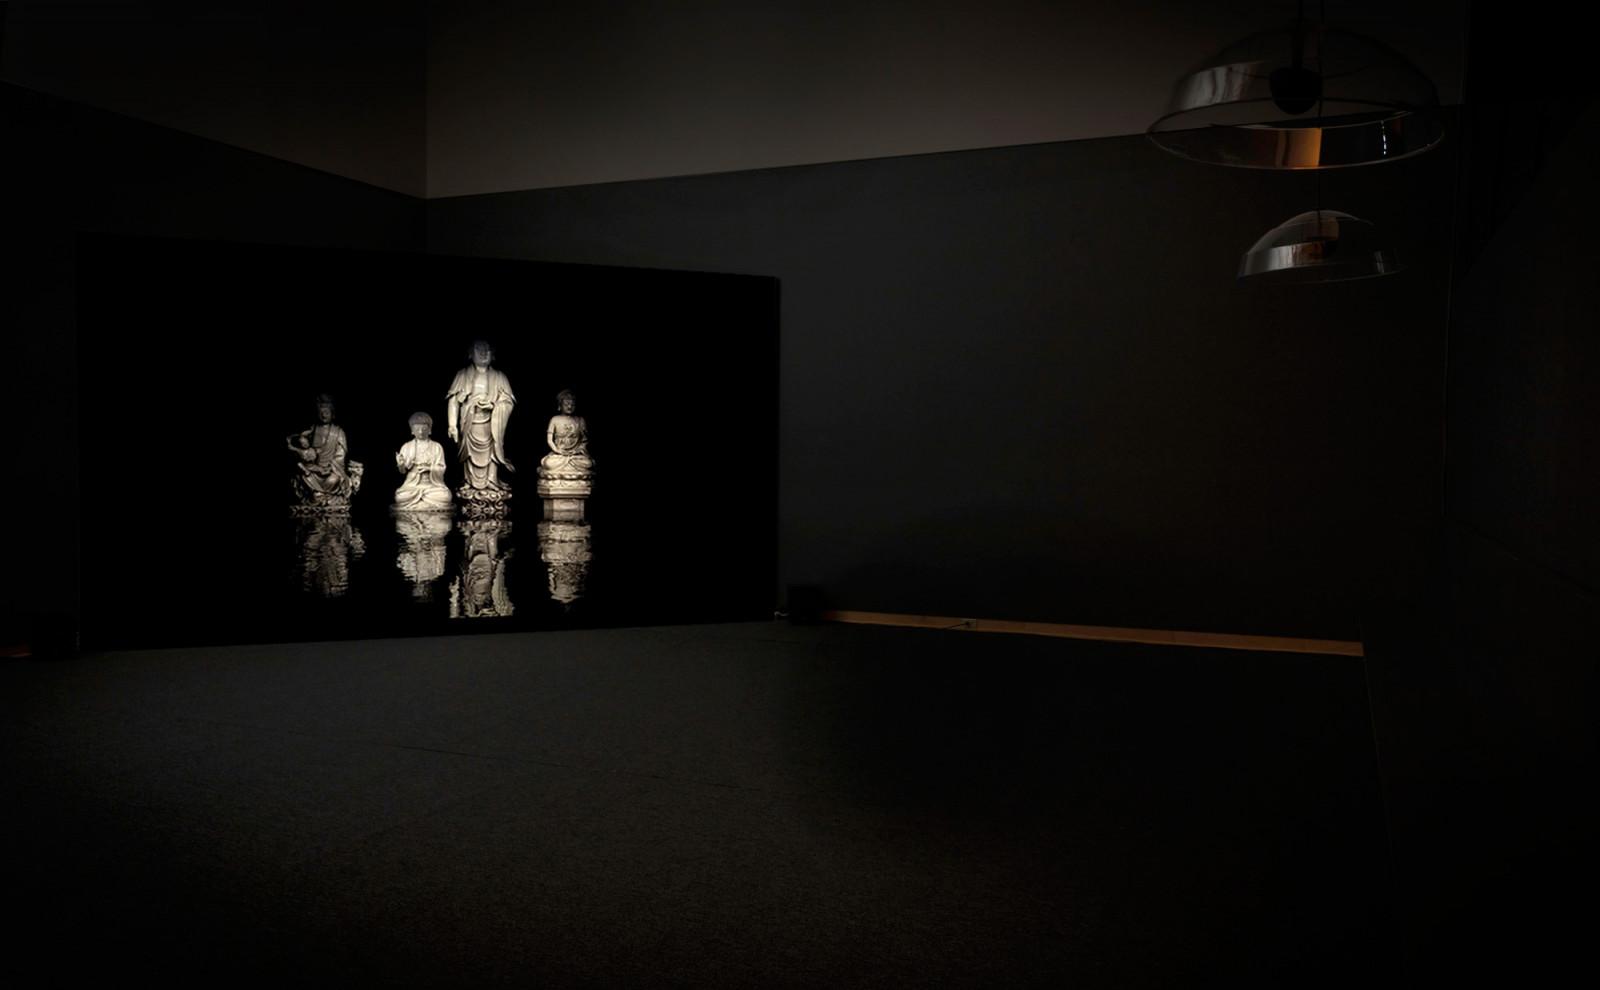 John Michael Kohler Arts Center, Wisconsin, US, 2020 (solo). Curated by Shannon Rae Stratton. Photo: JMKAC